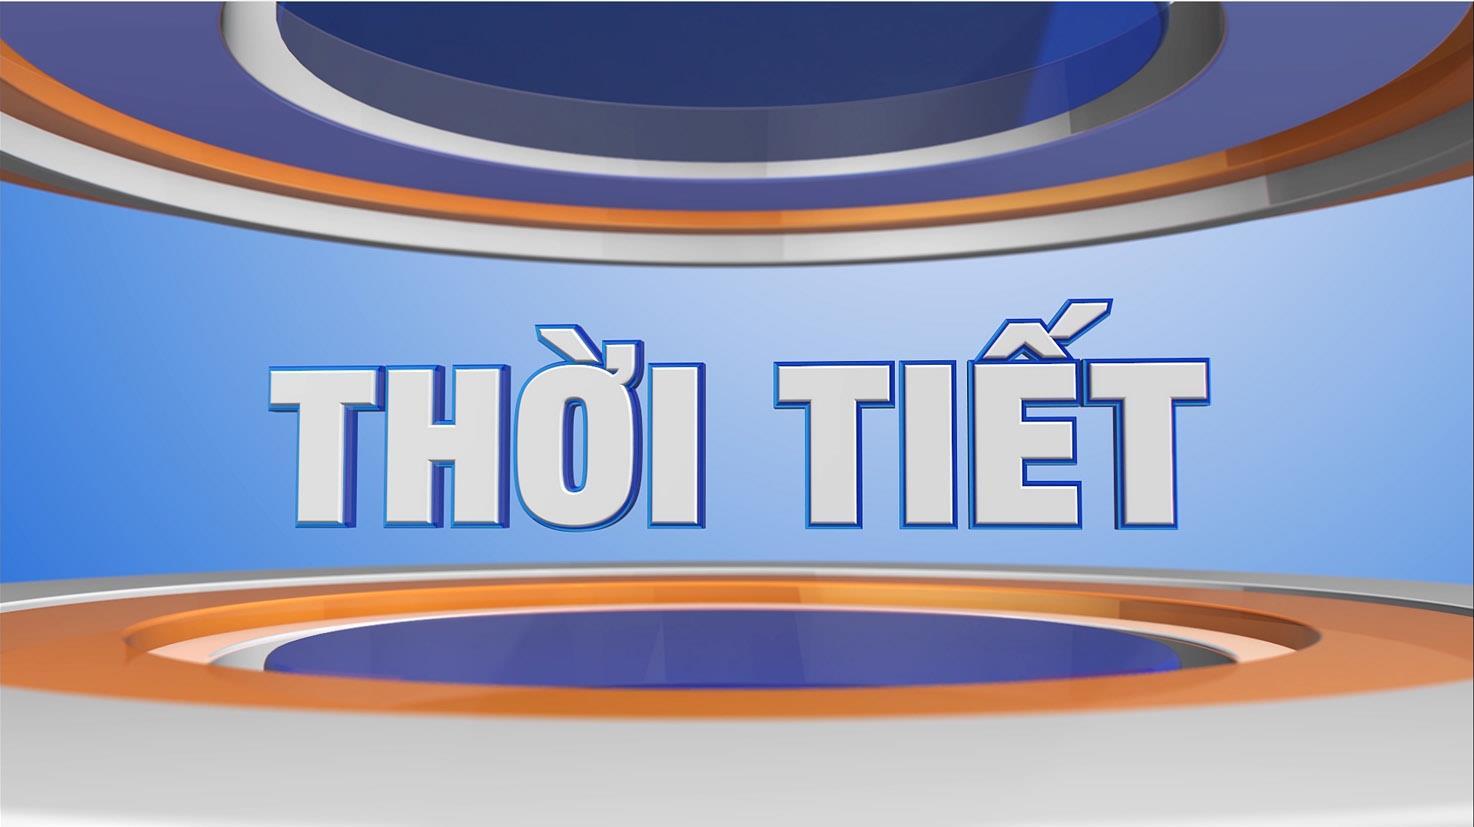 Thời sự 18h30 T2 (24-09-2018)